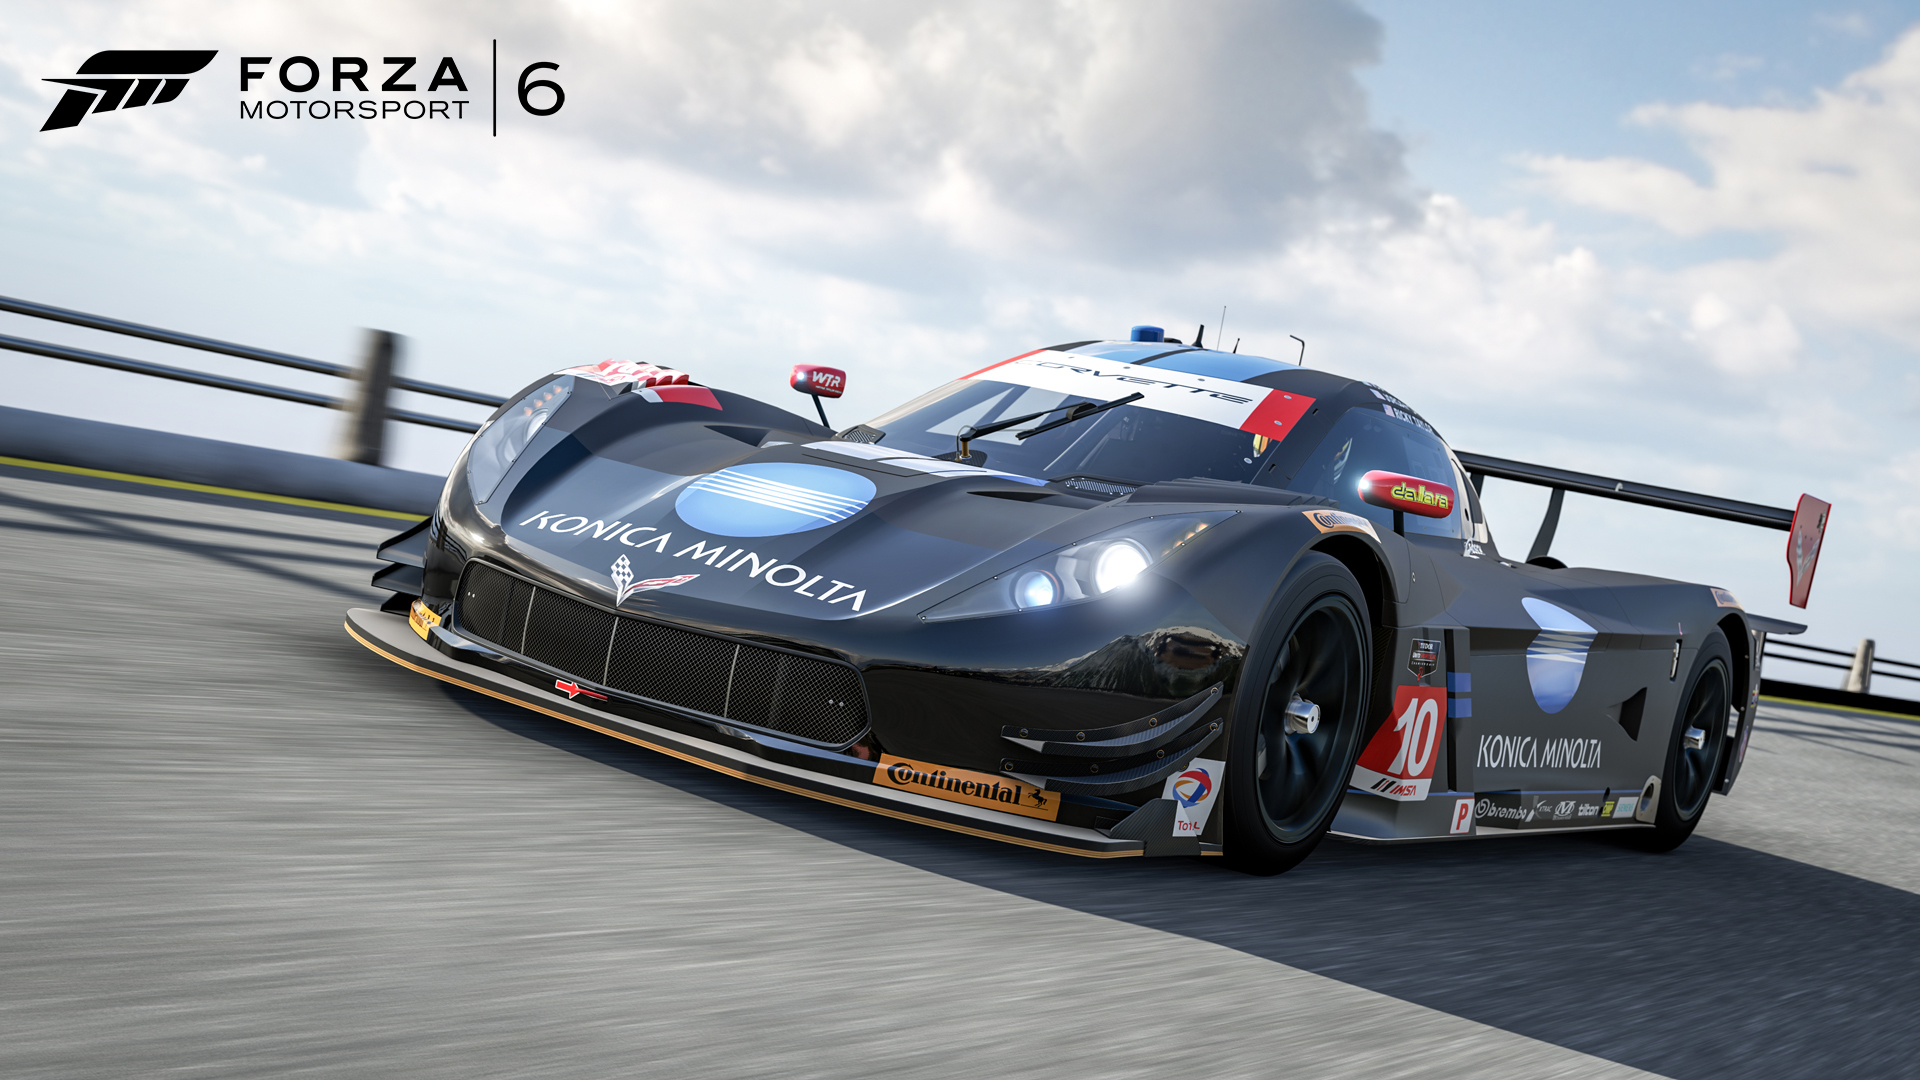 Mercedes Car Wallpapers For Windows 7 Forza Motorsport Forza Motorsport 6 Meguiar S Car Pack